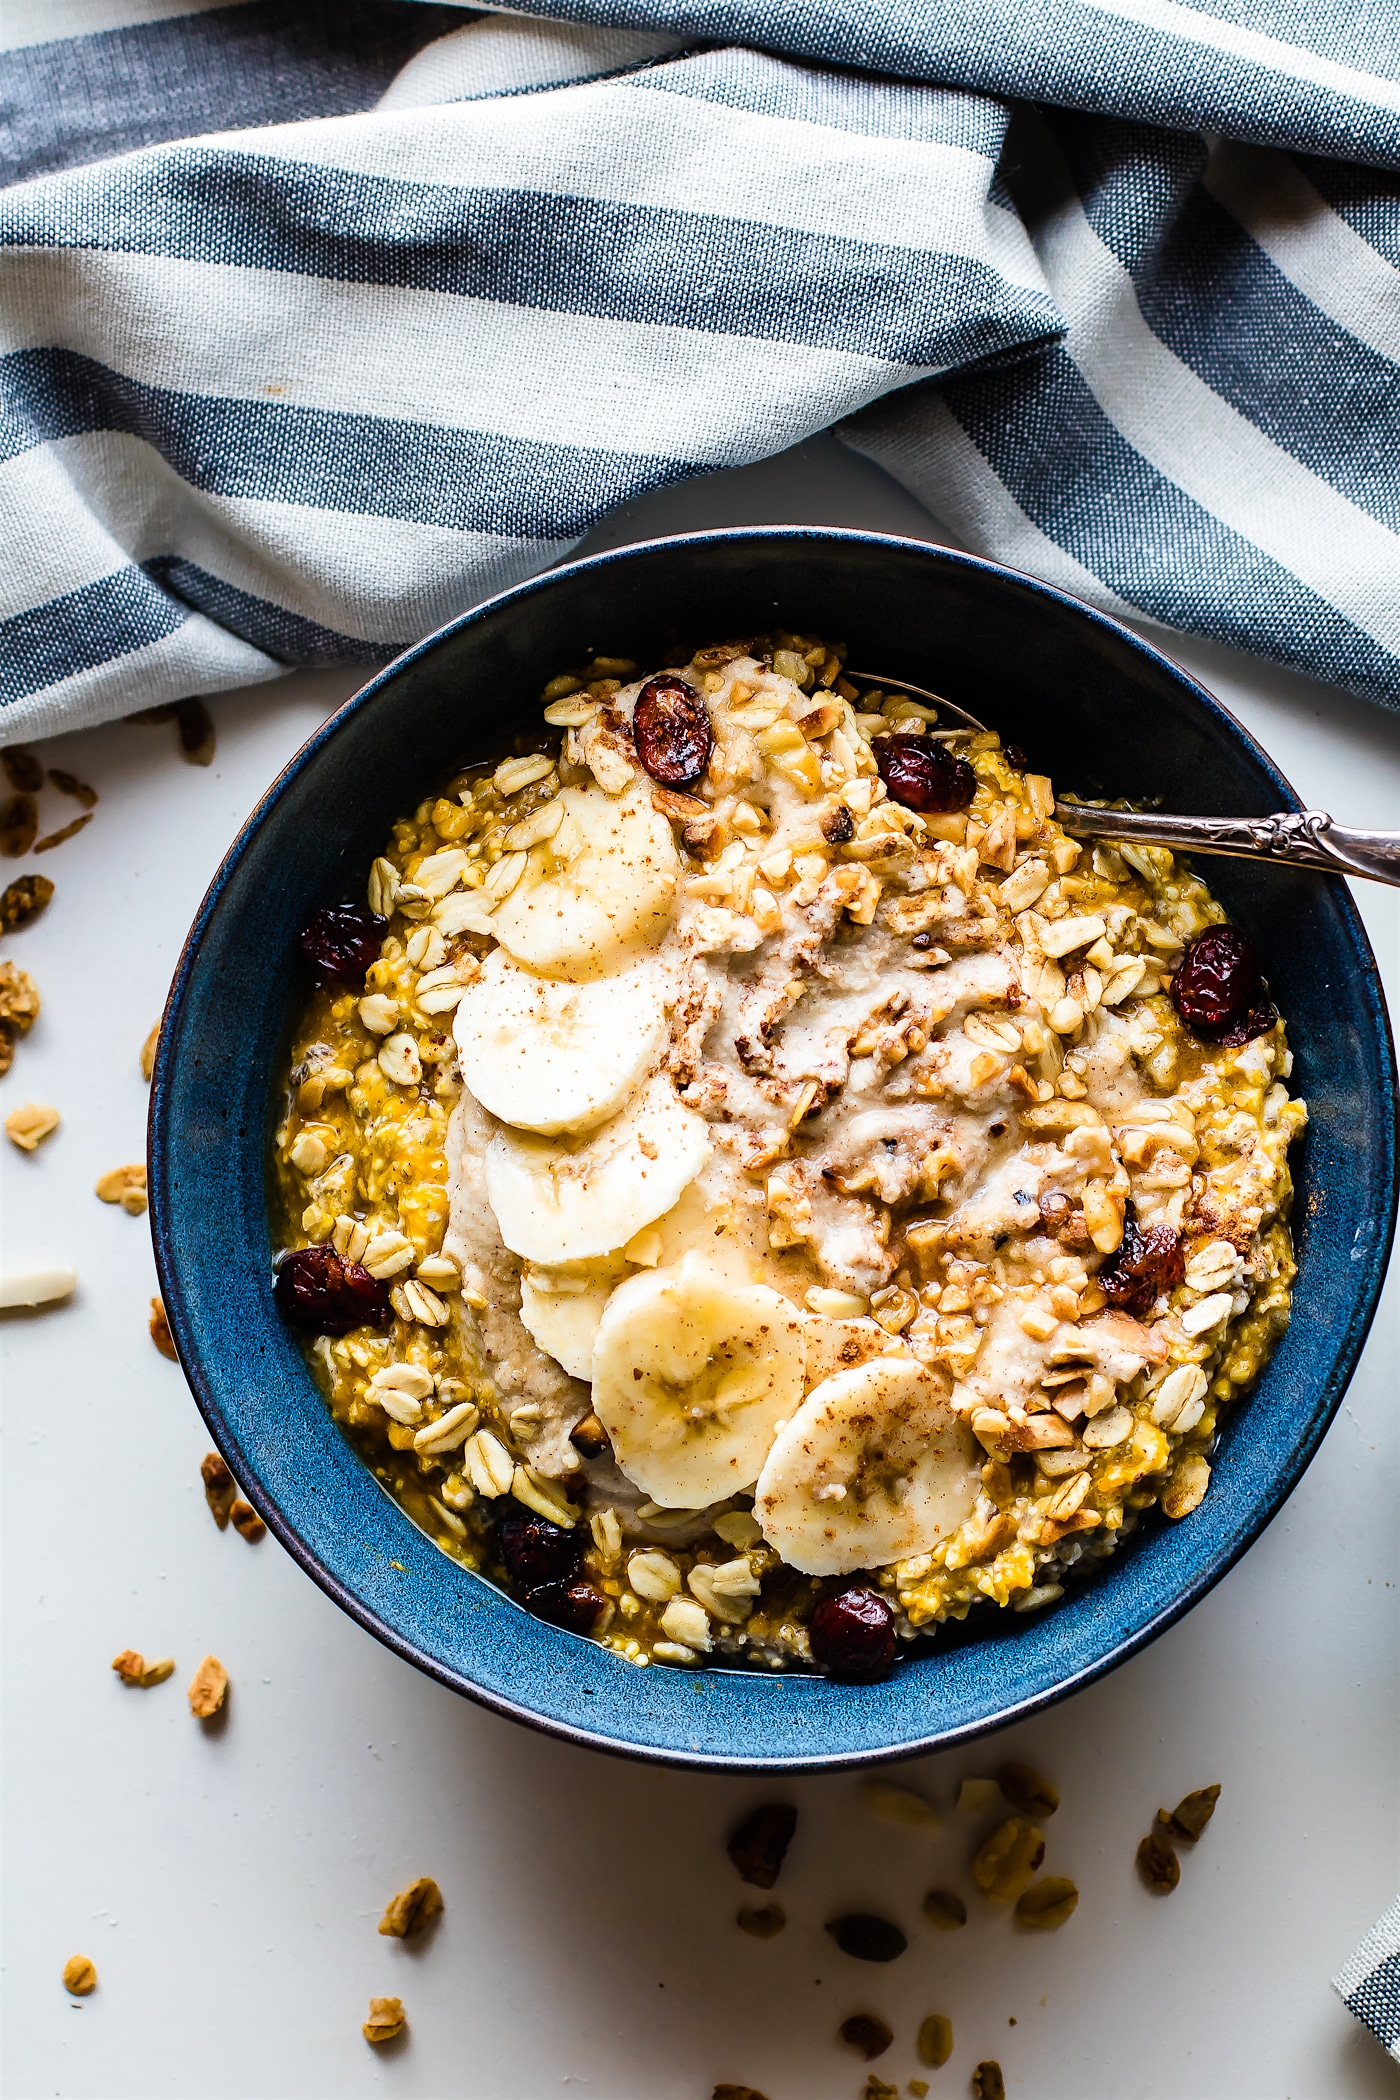 vegan-pumpkin-overnight-oats-with-cinnamon-cashew-cream-6